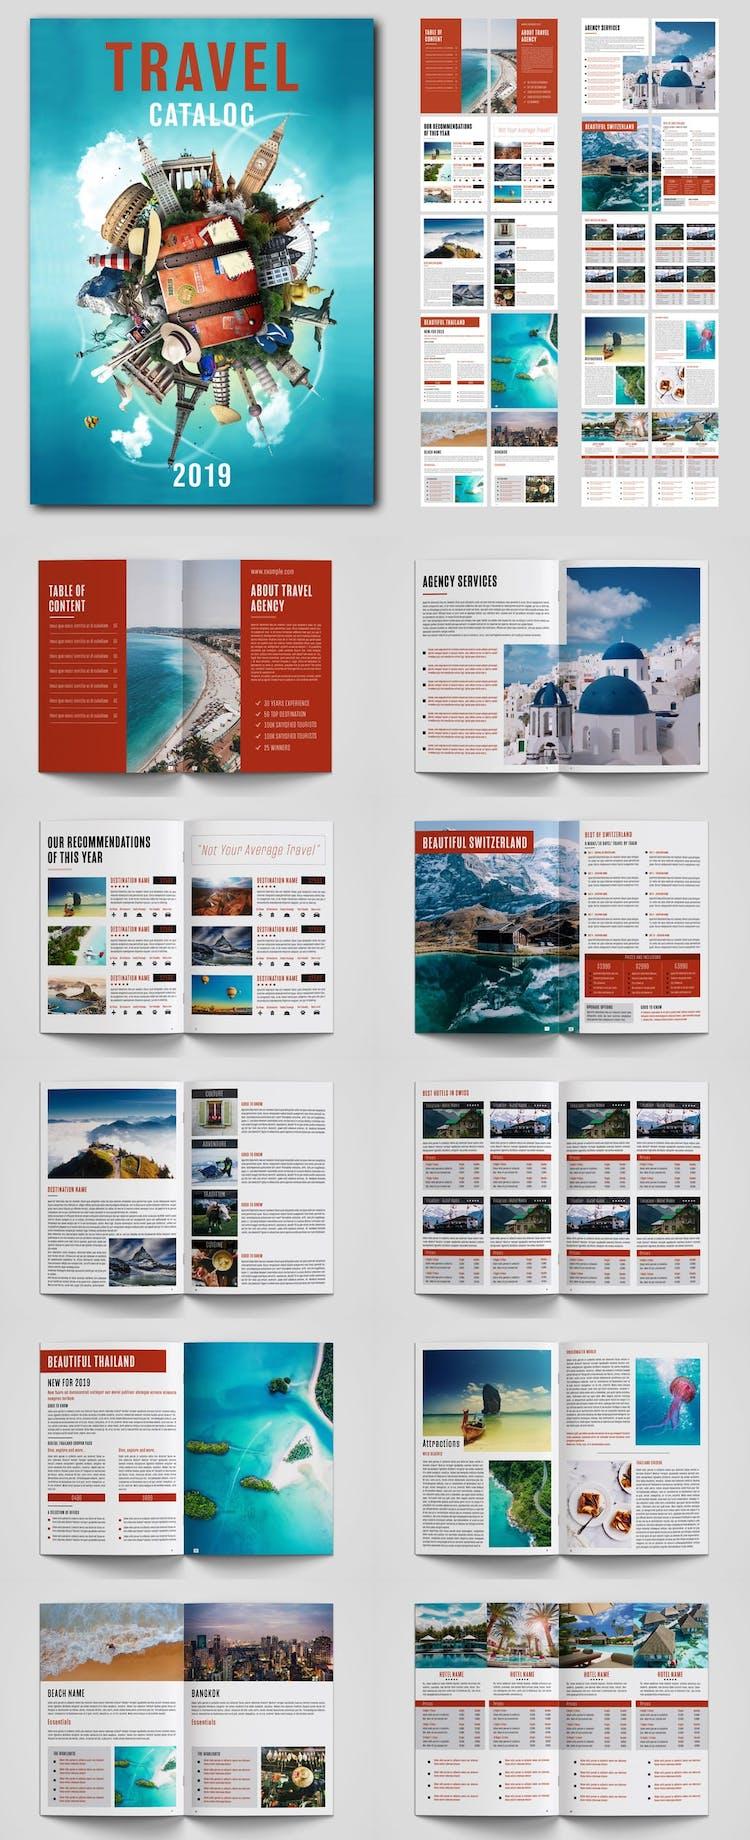 Plantilla de catálogo de viajes